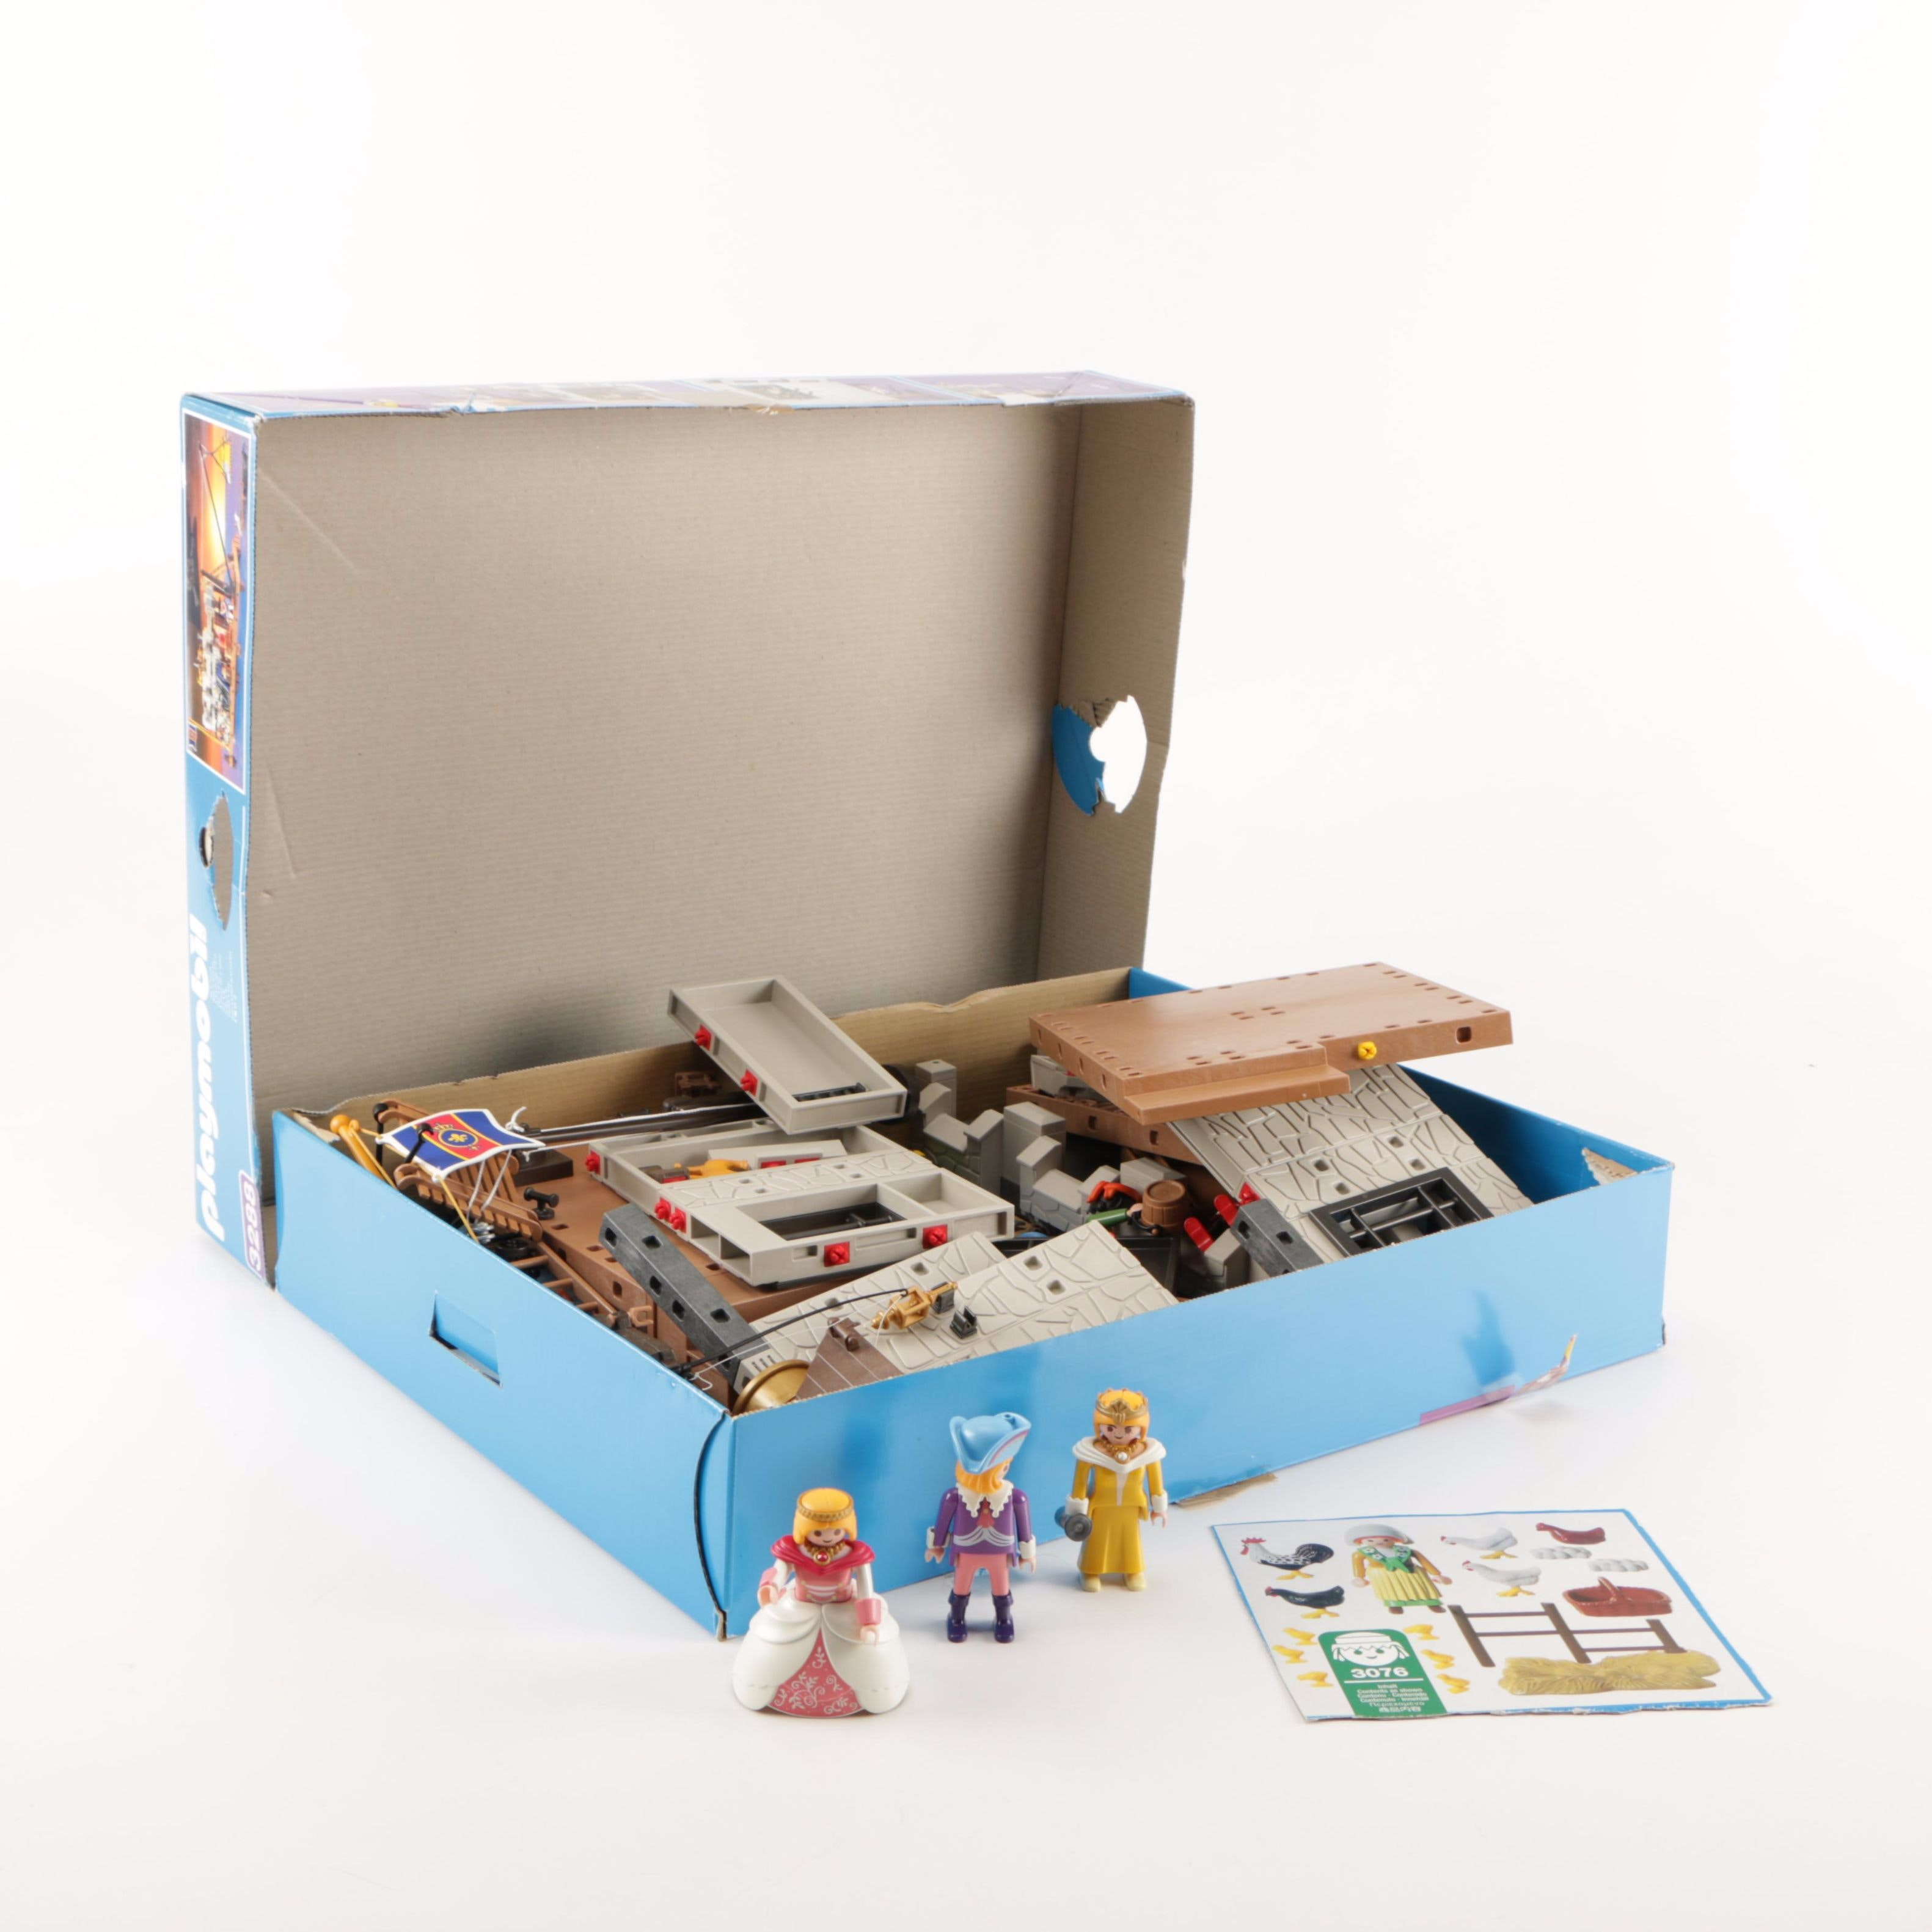 Playmobil Castle Dock Set